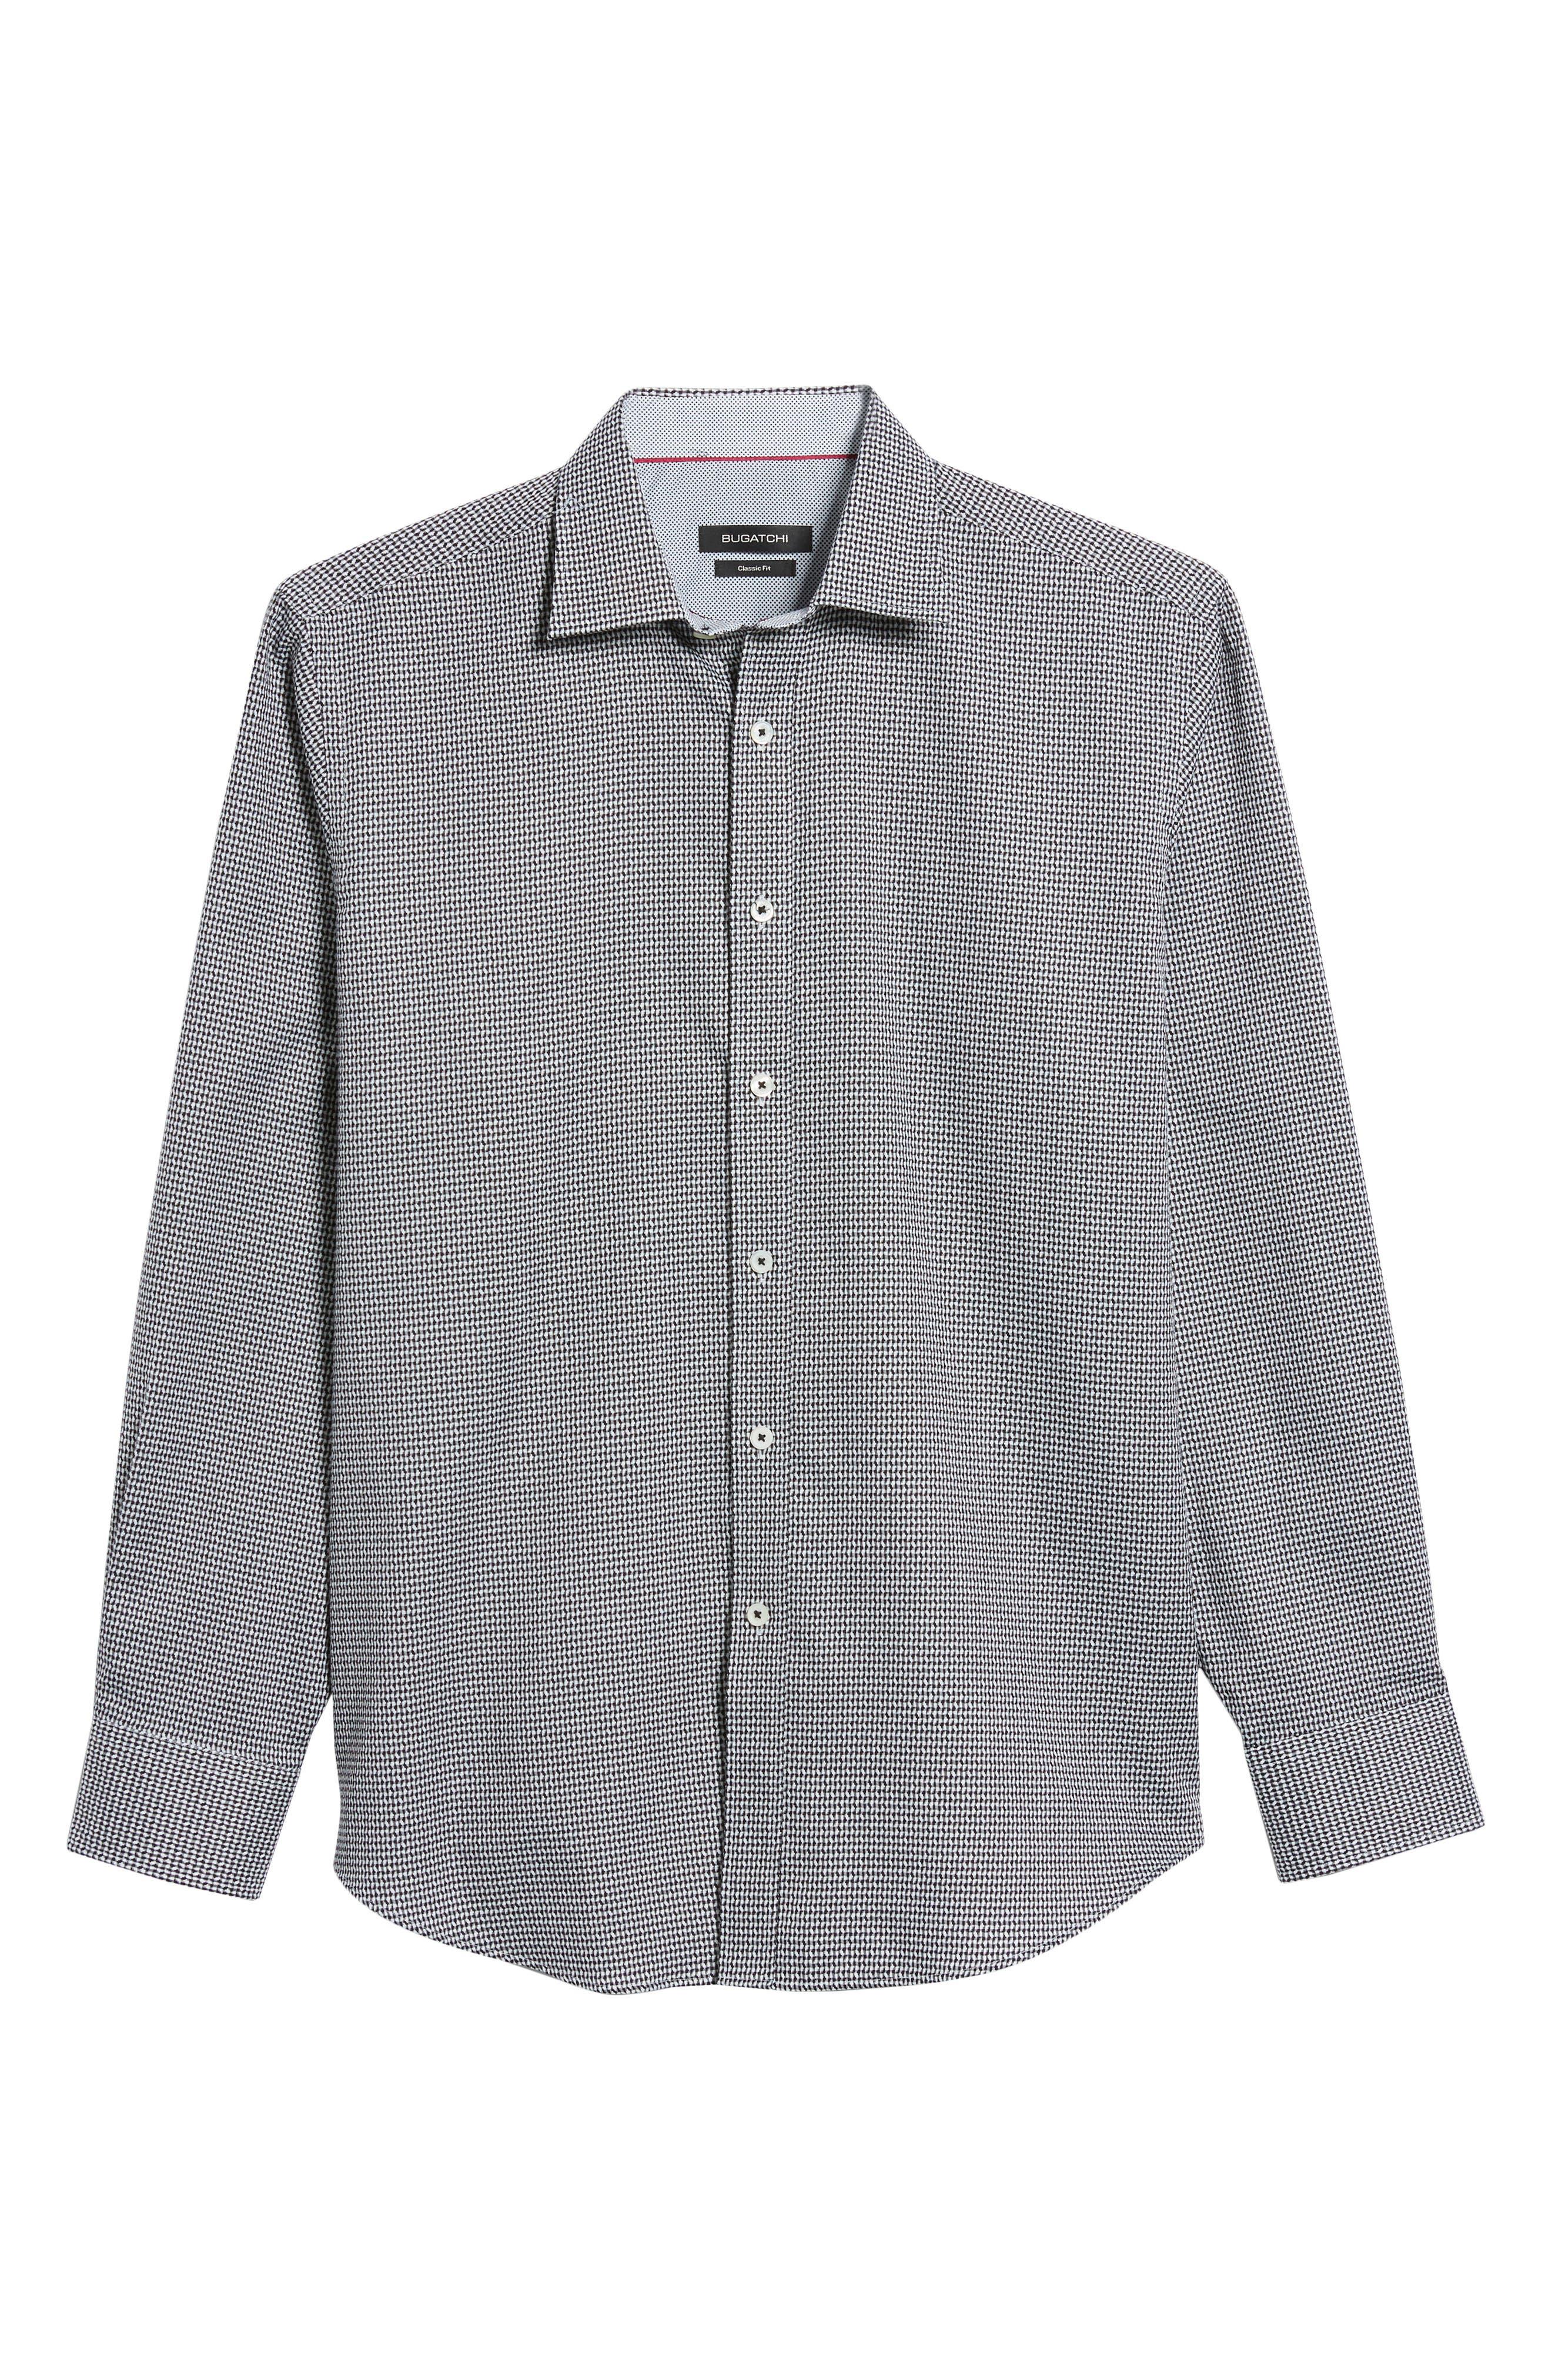 Classic Fit Lines of Distinction Print Sport Shirt,                             Alternate thumbnail 6, color,                             001